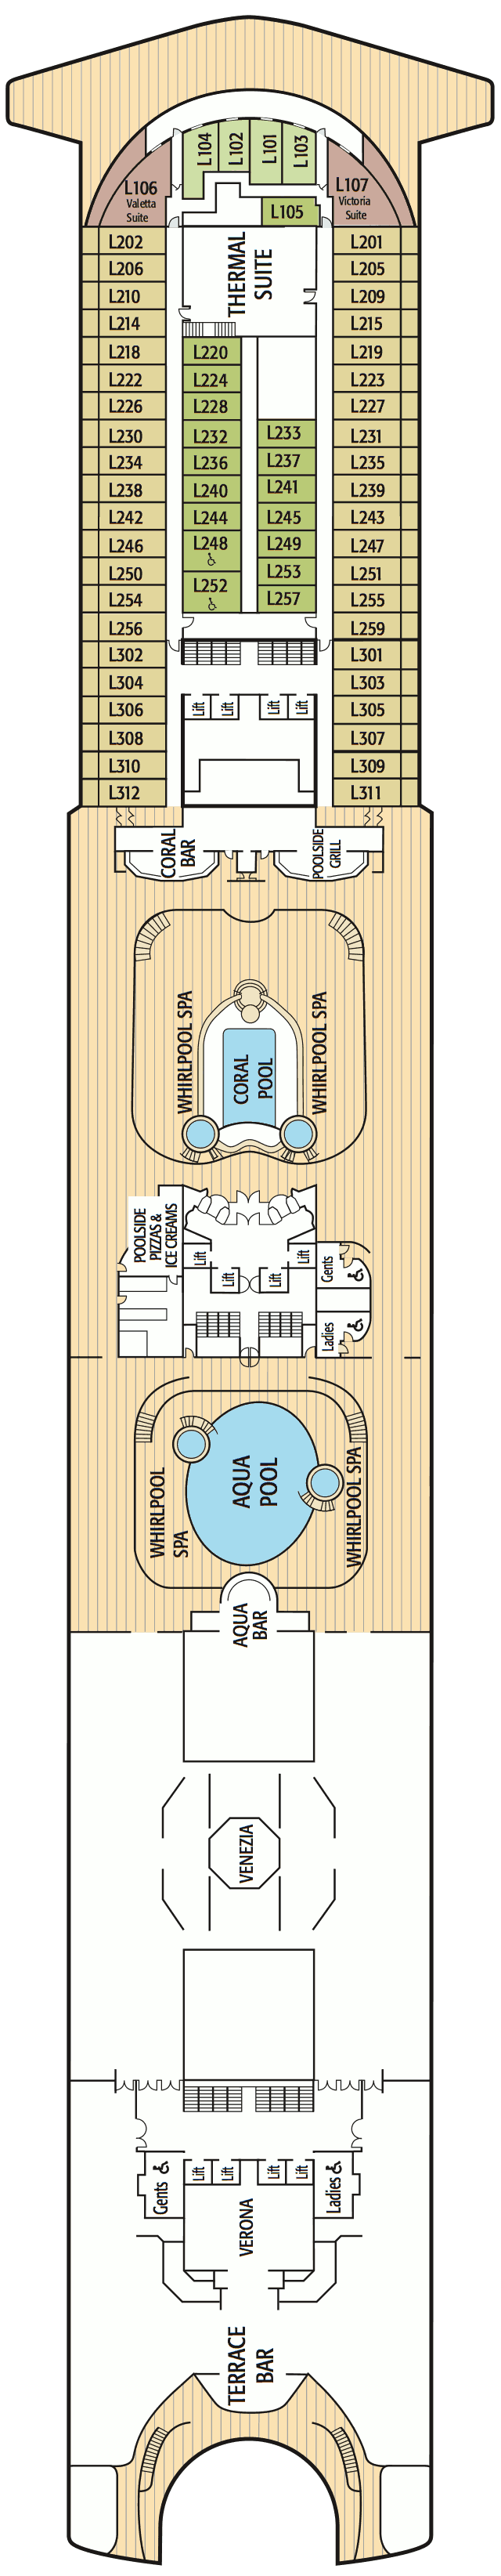 Azura Deck 15